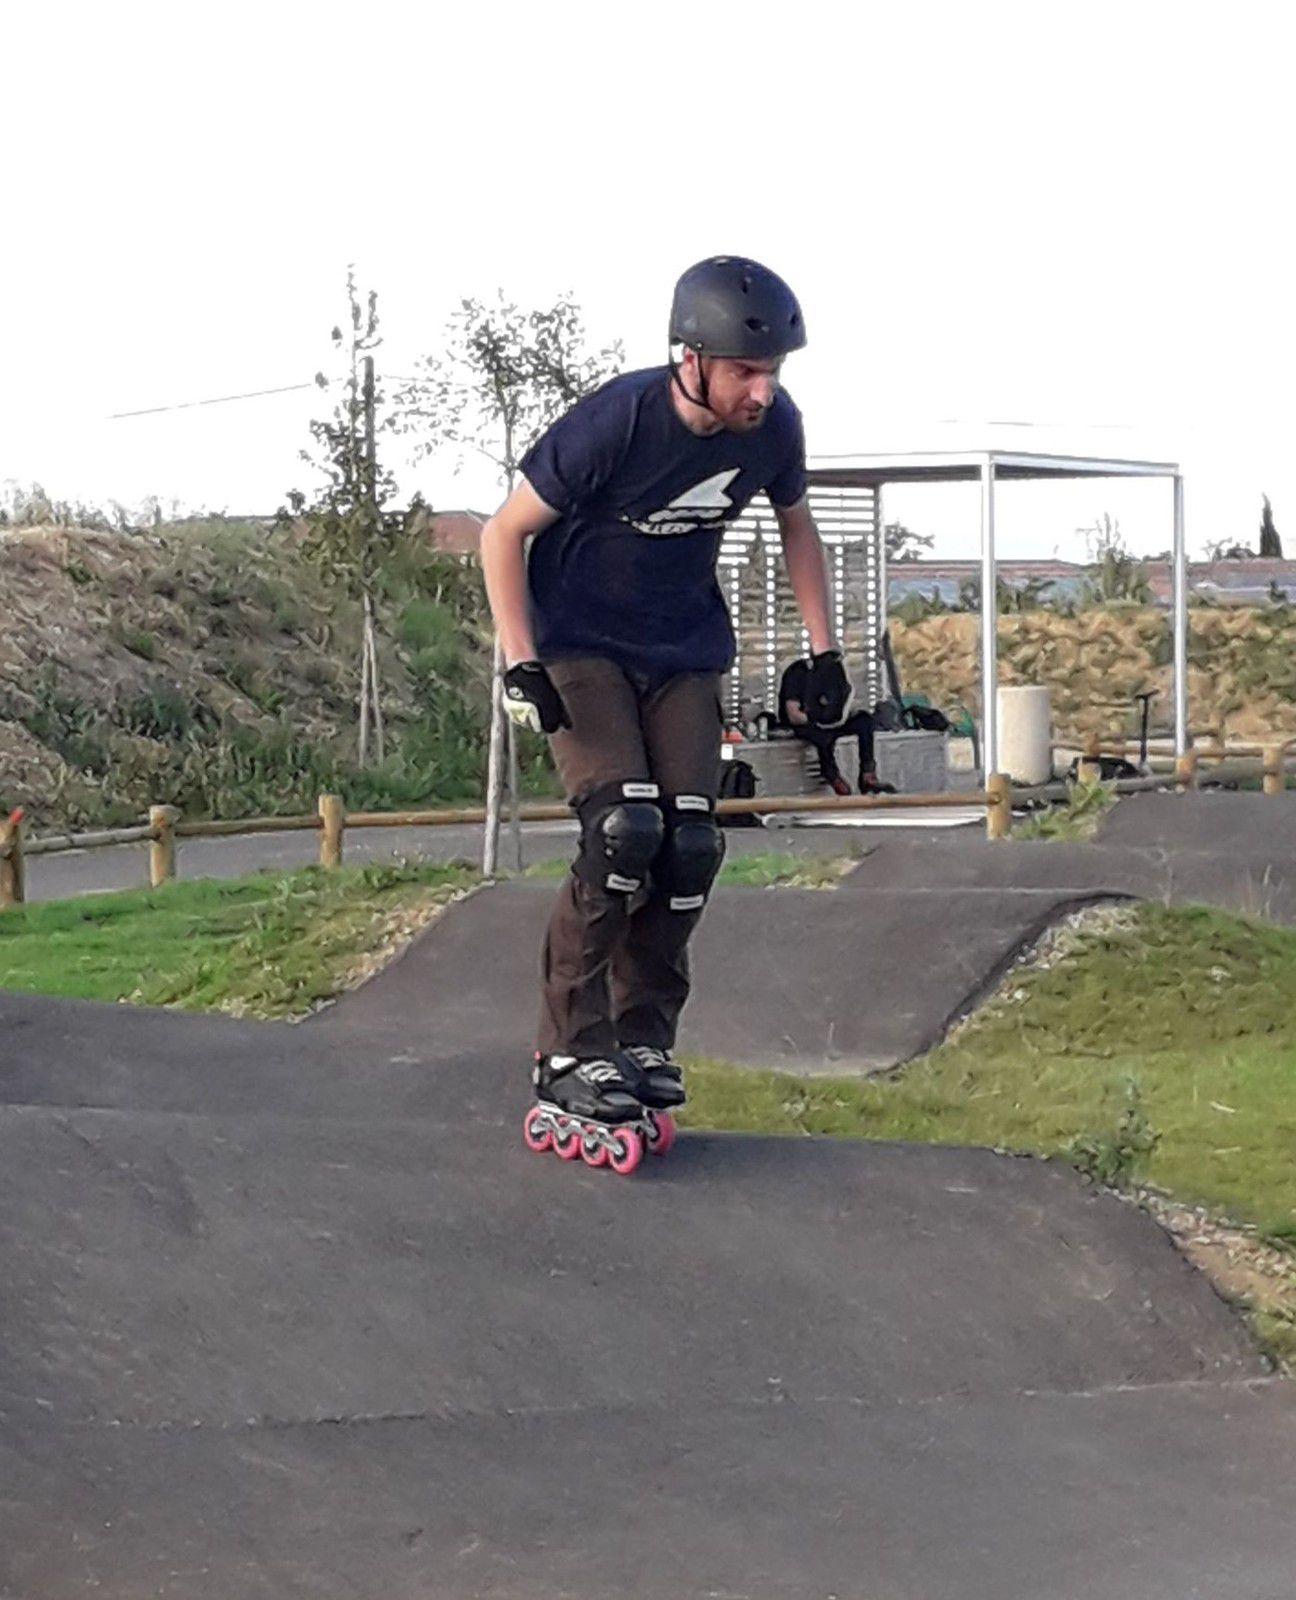 Cours roller à Nîmes, club labellisé, Gard, skating, FFRS